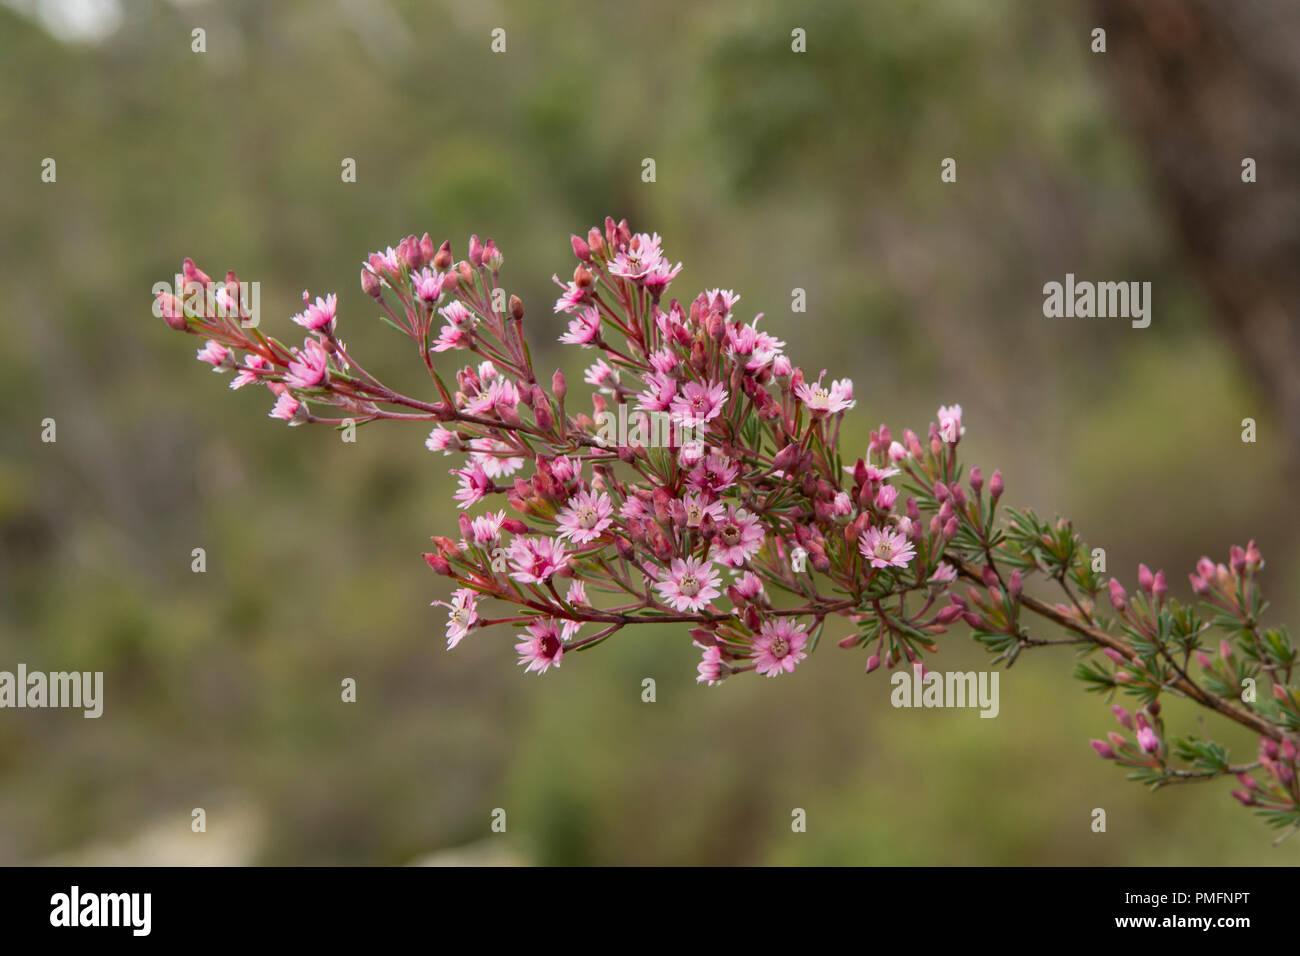 Verticordia plumosa, Plumed Featherflower - Stock Image